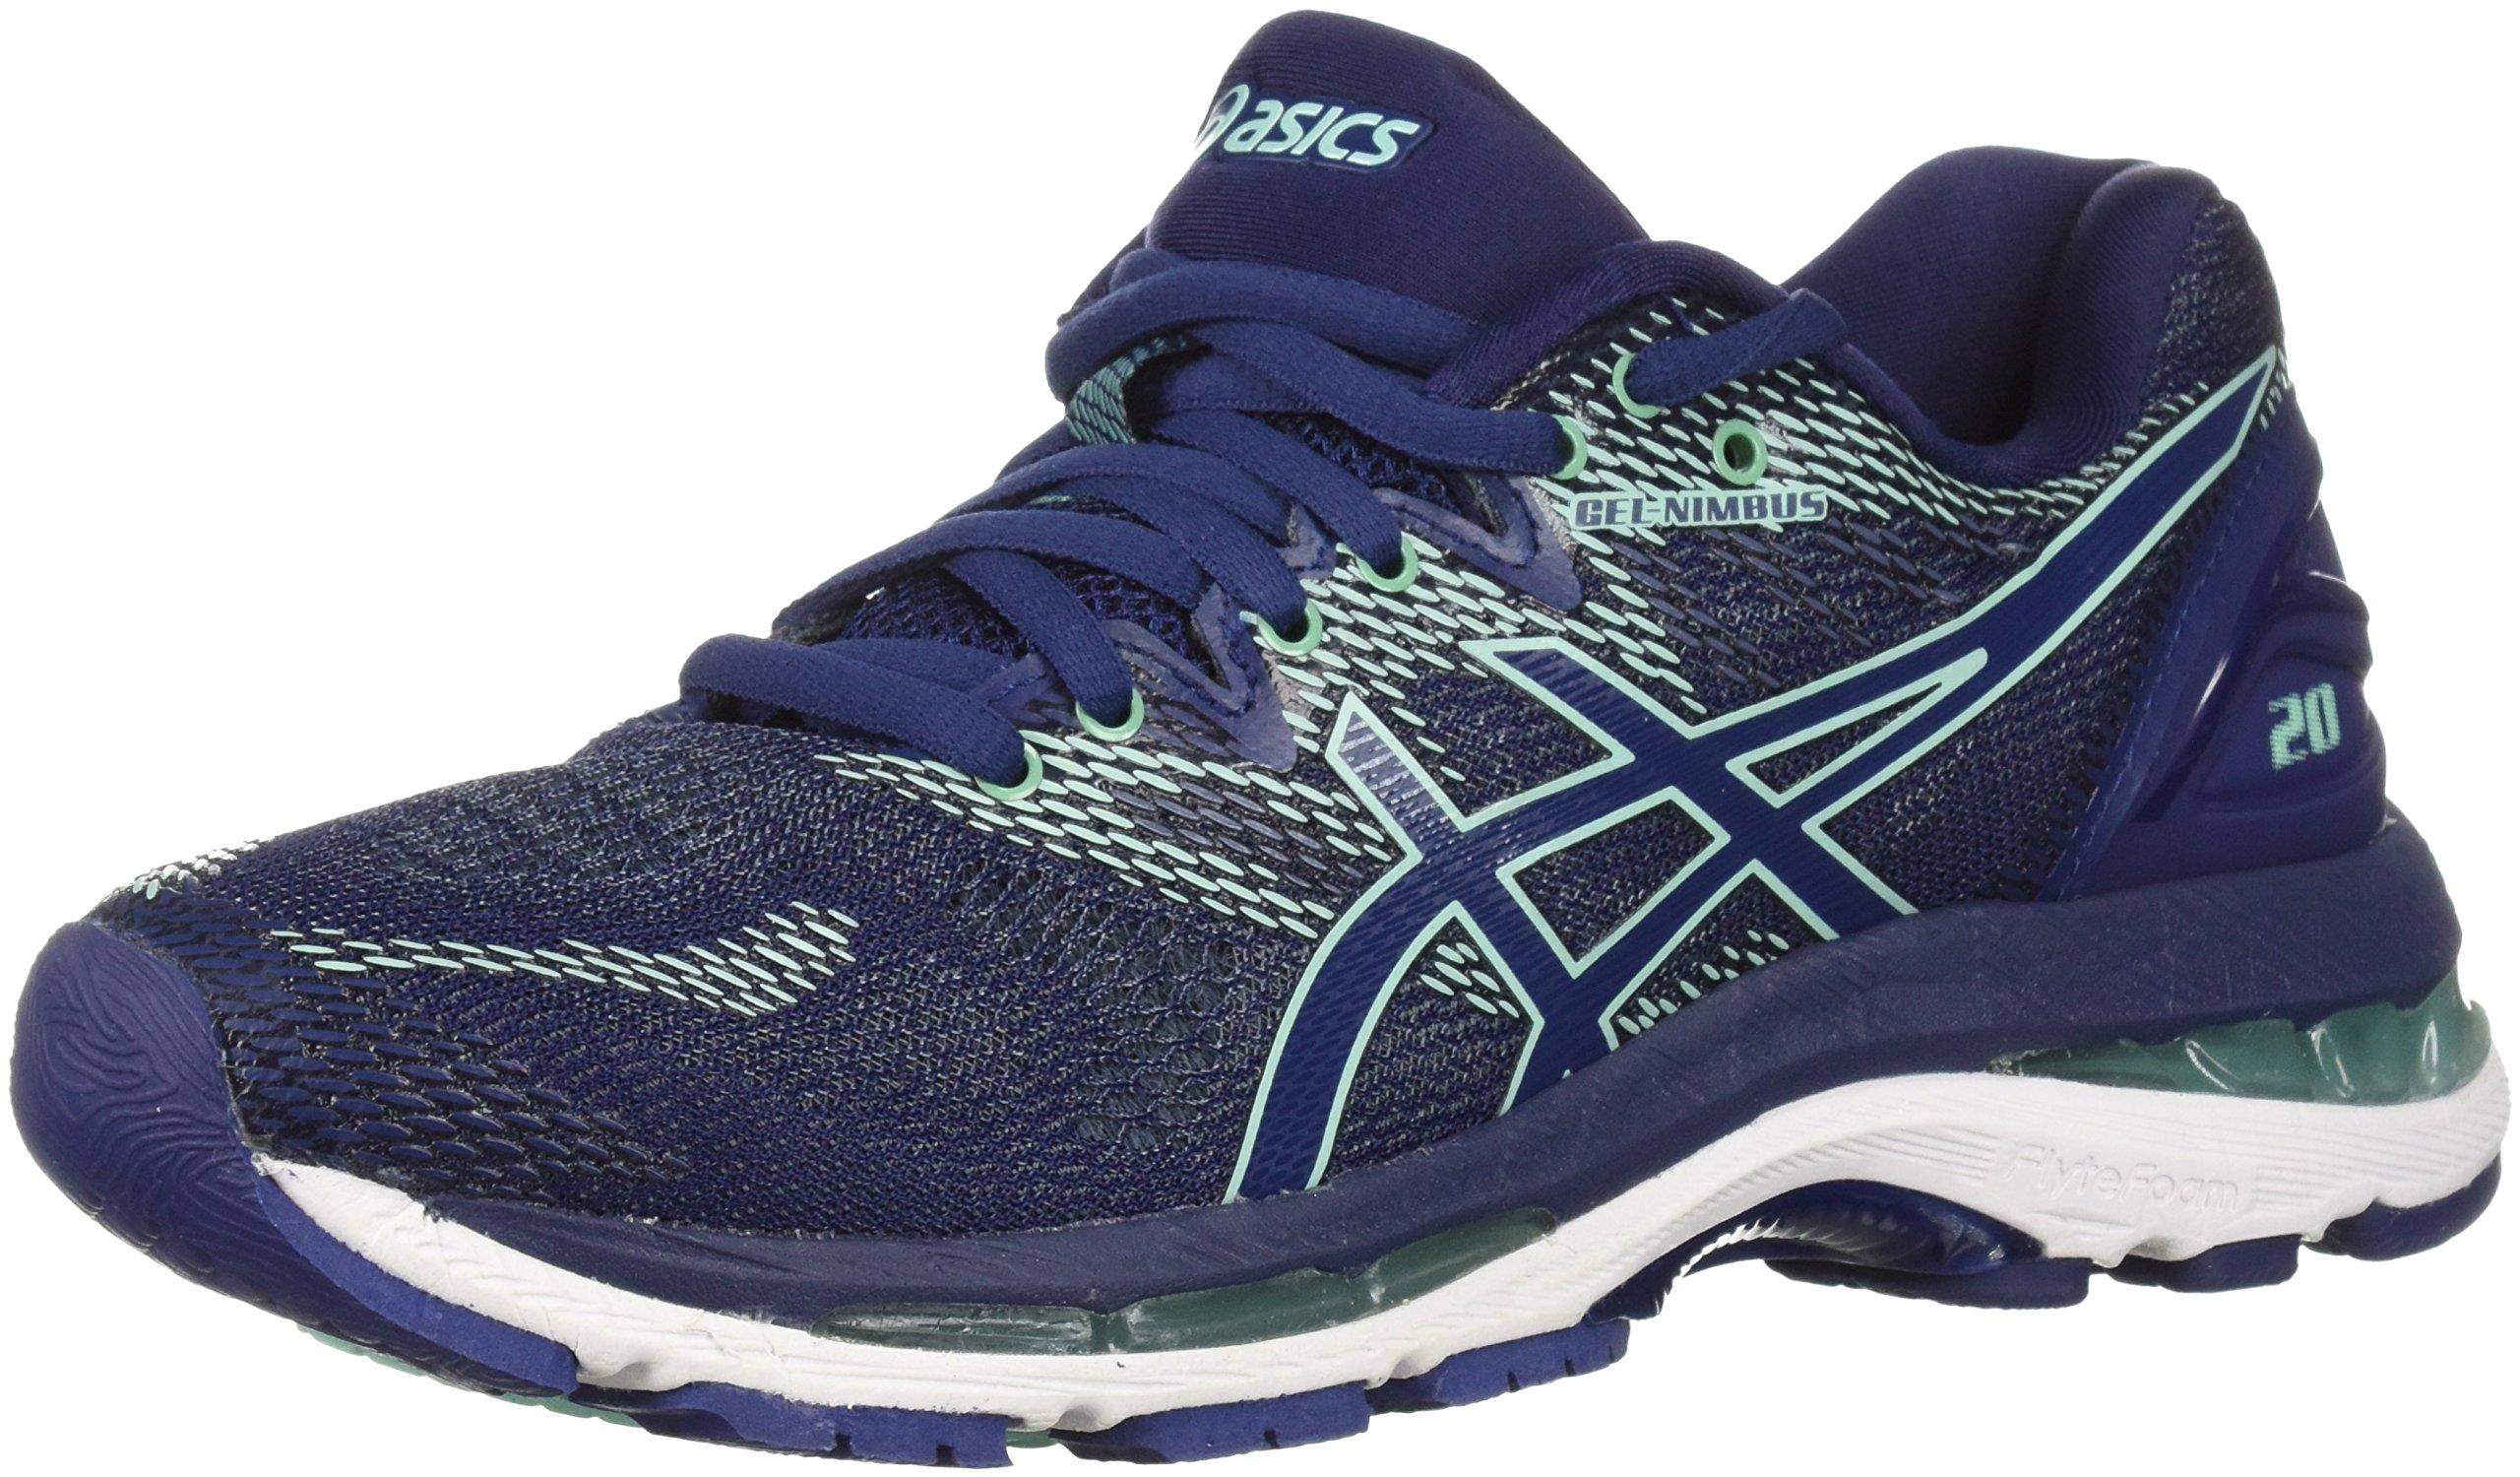 ASICS Women's Gel-Nimbus 20 Running Shoe, indigo blue/indigo blue/opal green, 9.5 Medium US by ASICS